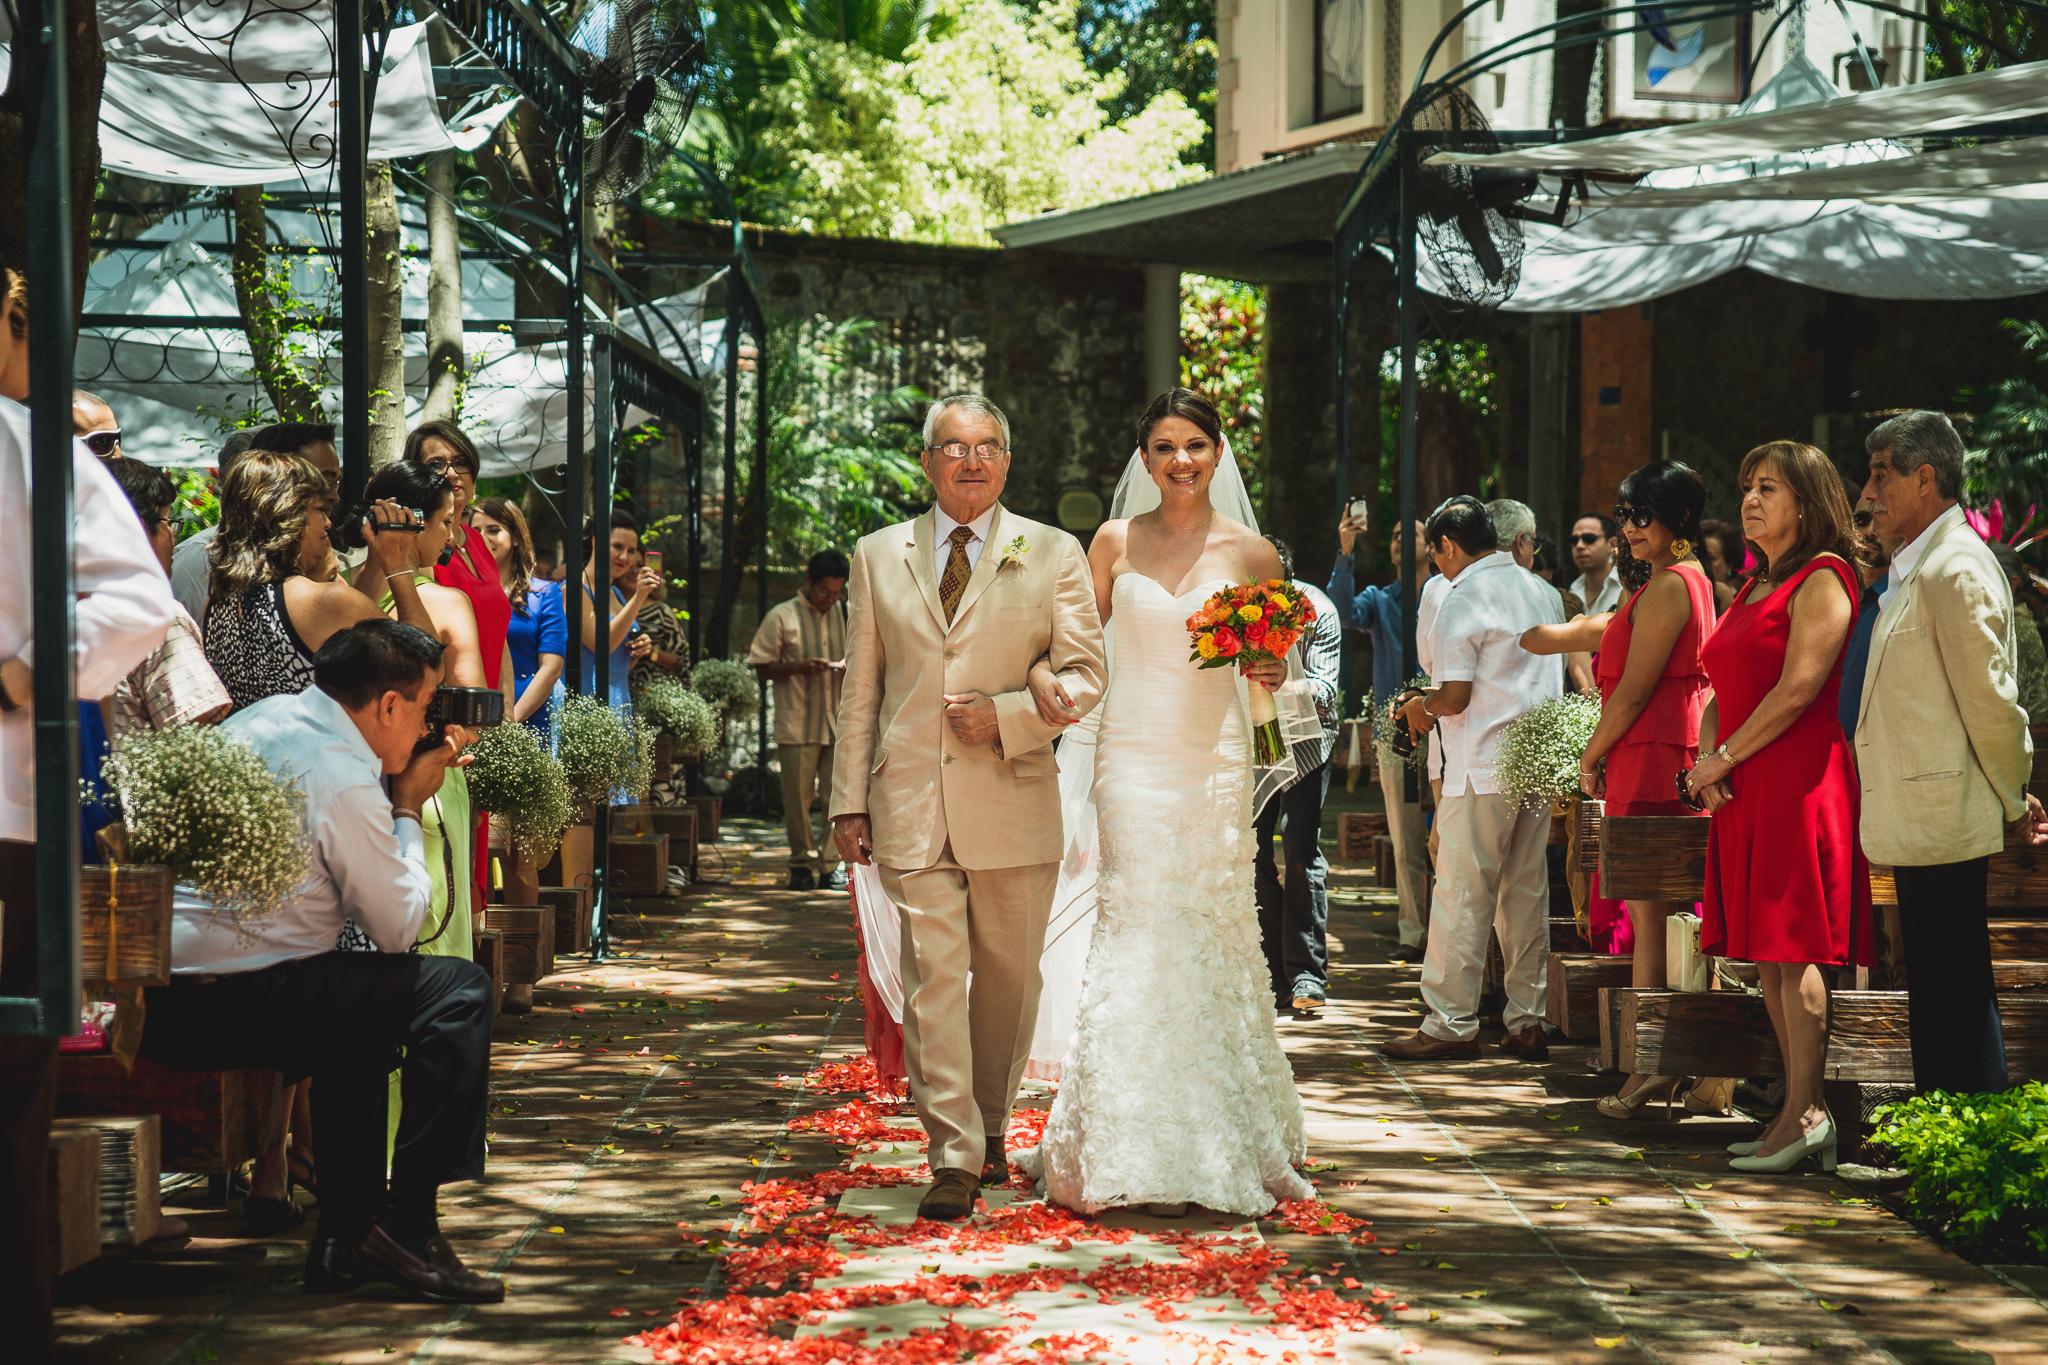 wedding-photography-mexico-quinta-rubelinas-37.jpg